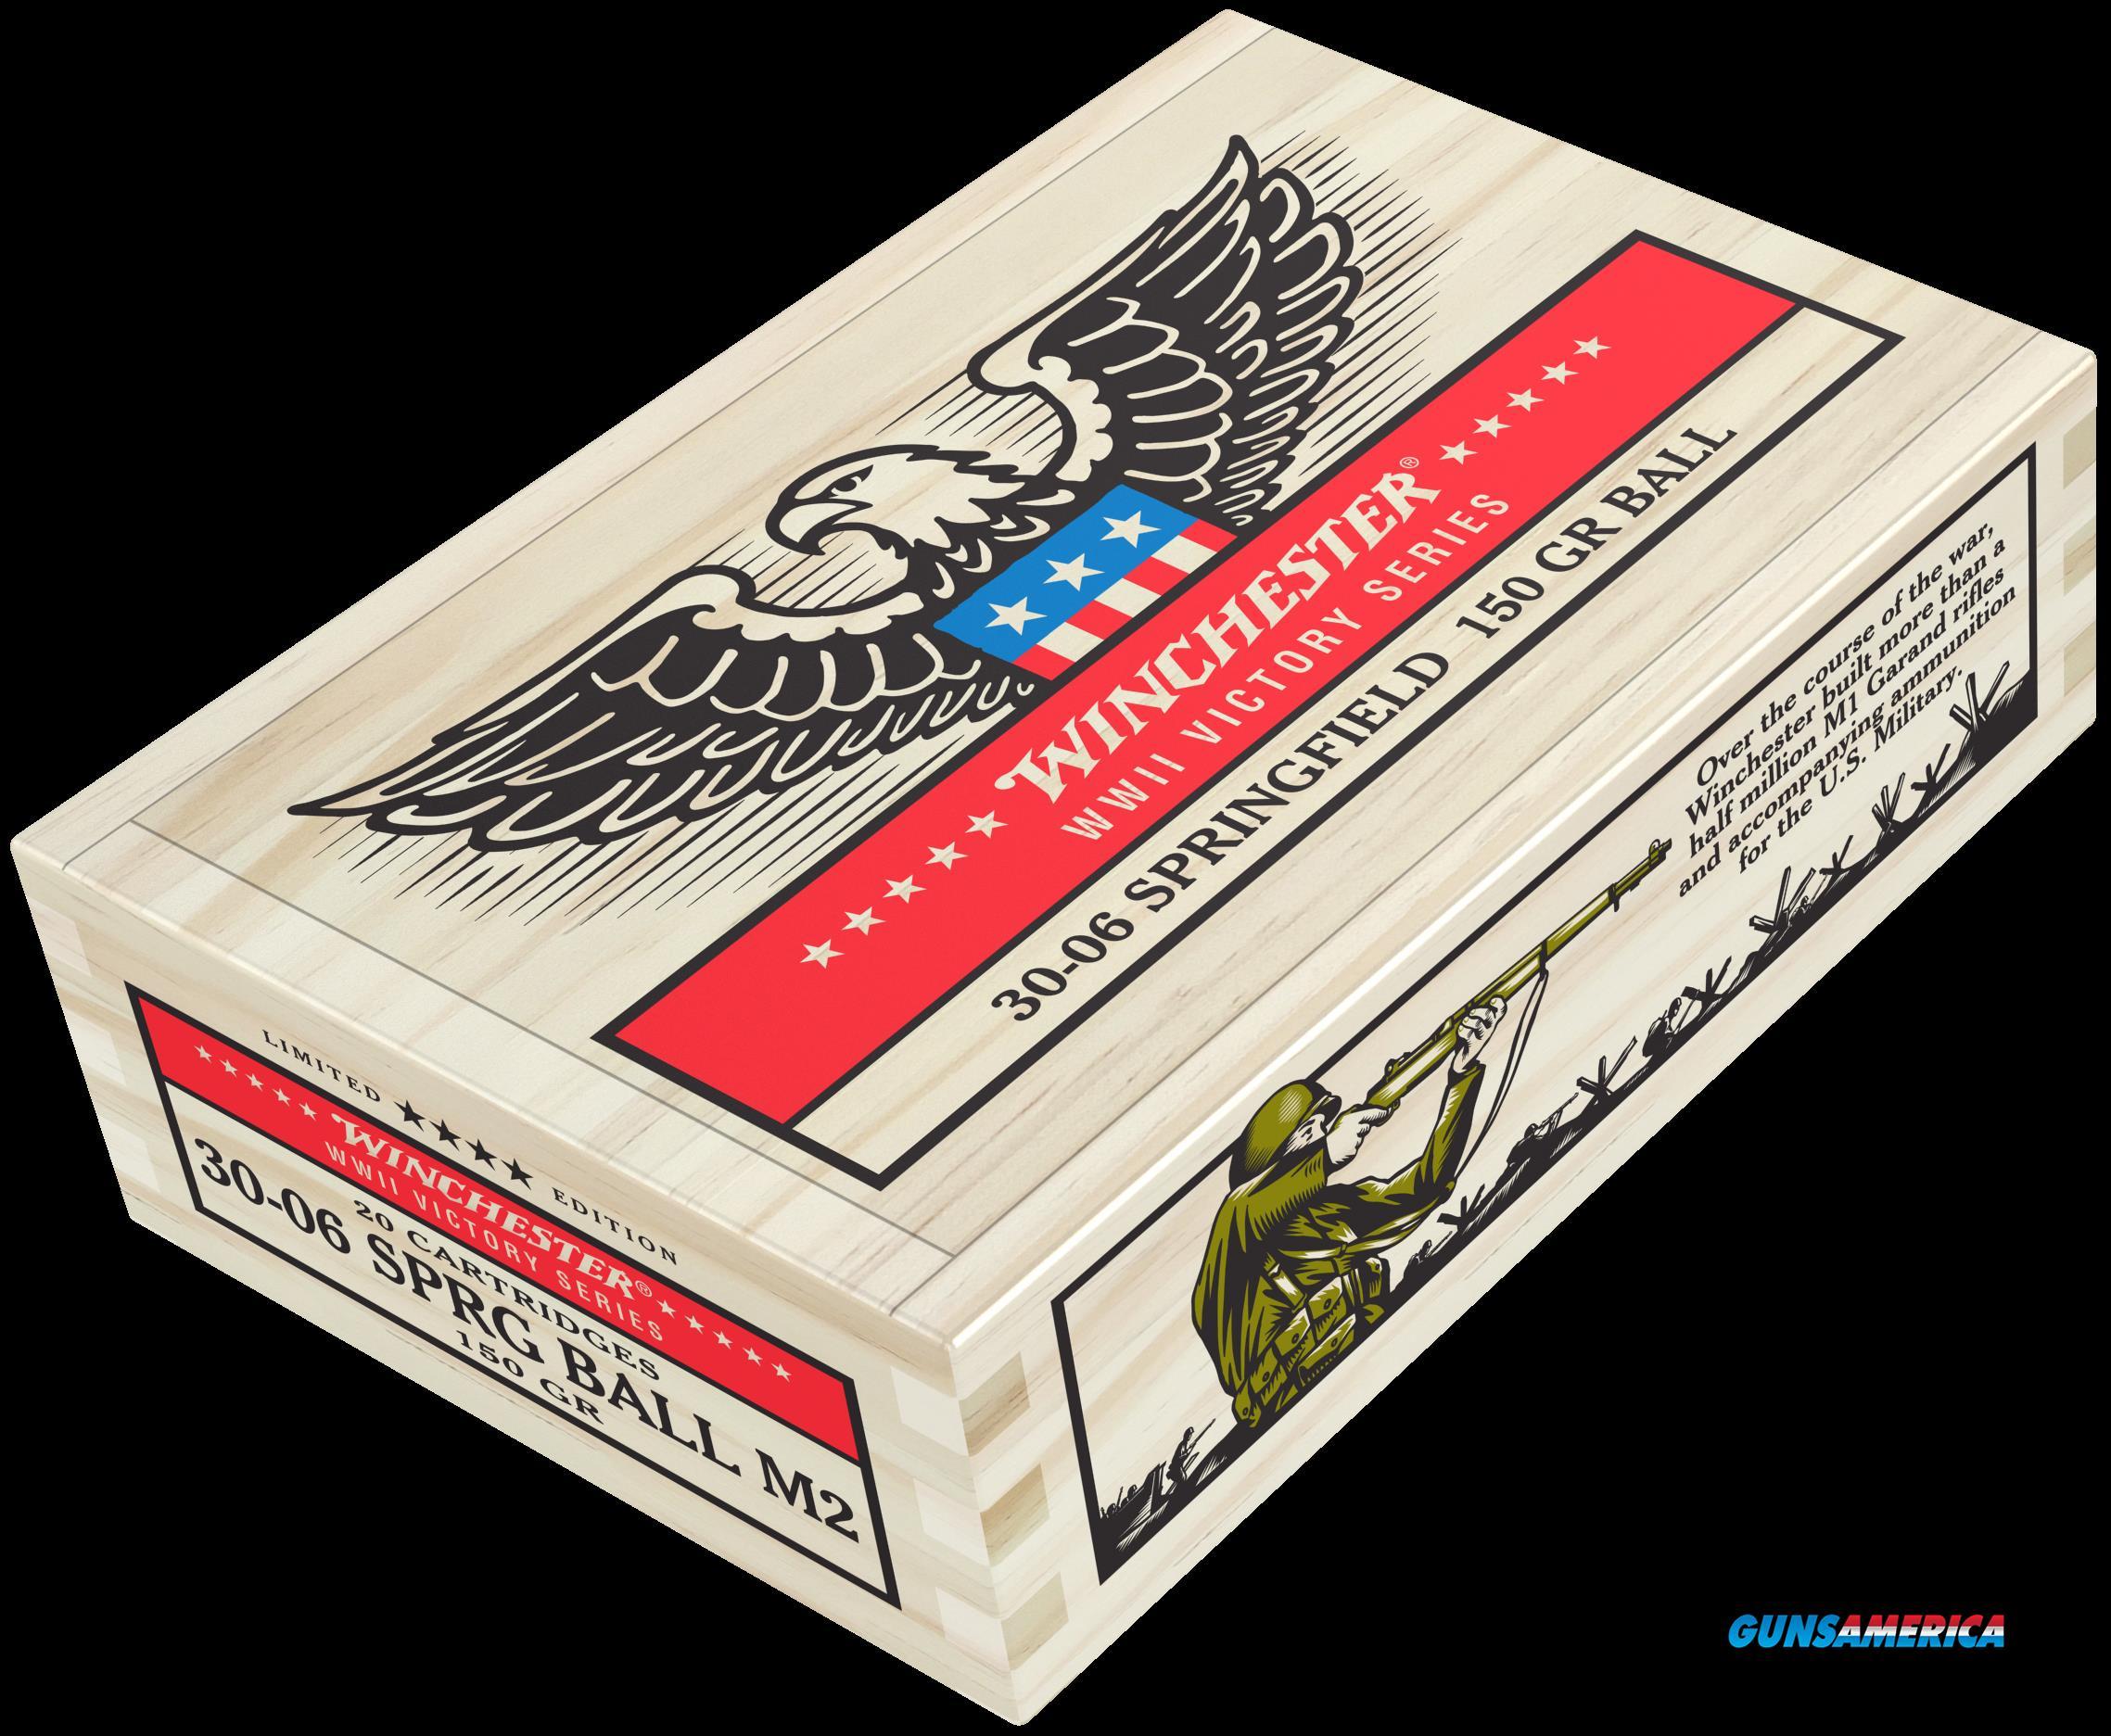 Winchester Ammo Wwii Victory Series, Win X3006ww2      3006   150 Flat Bs M2 20-5 Vict  Guns > Pistols > 1911 Pistol Copies (non-Colt)